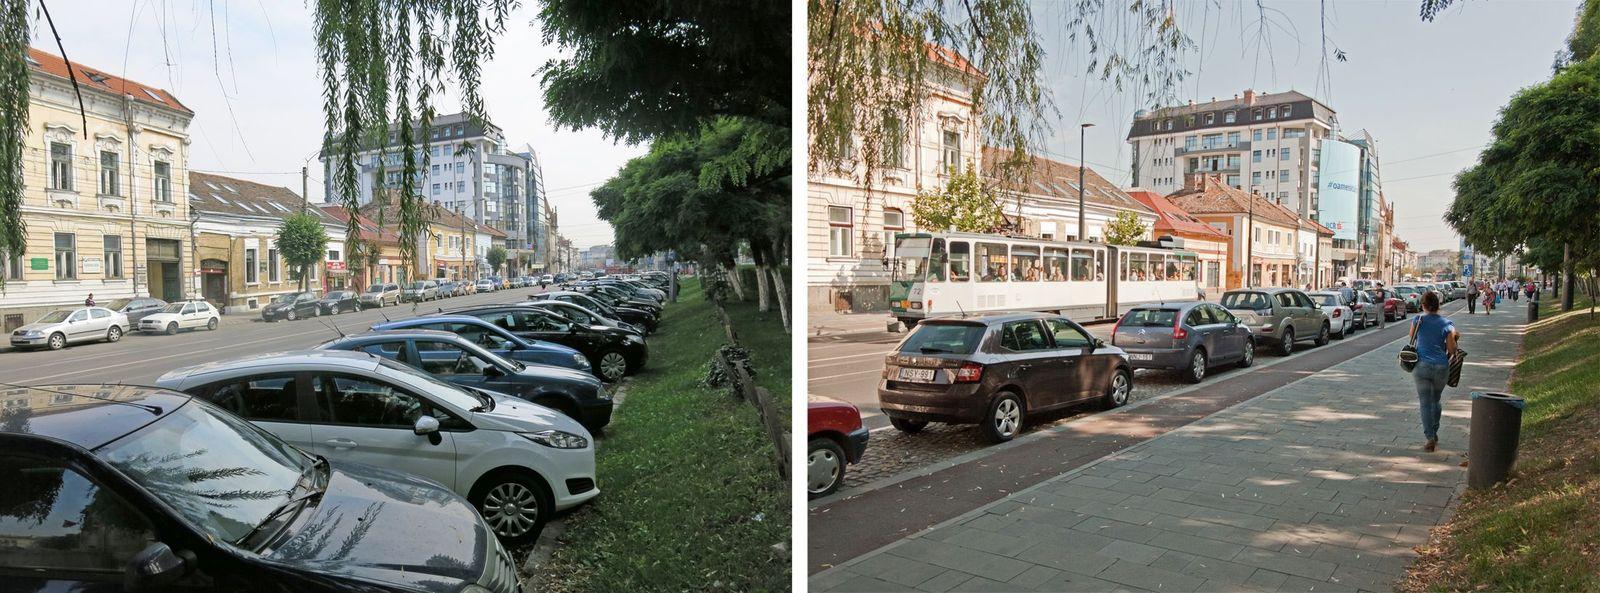 Strada George Barițiu înainte și după reabilitare.